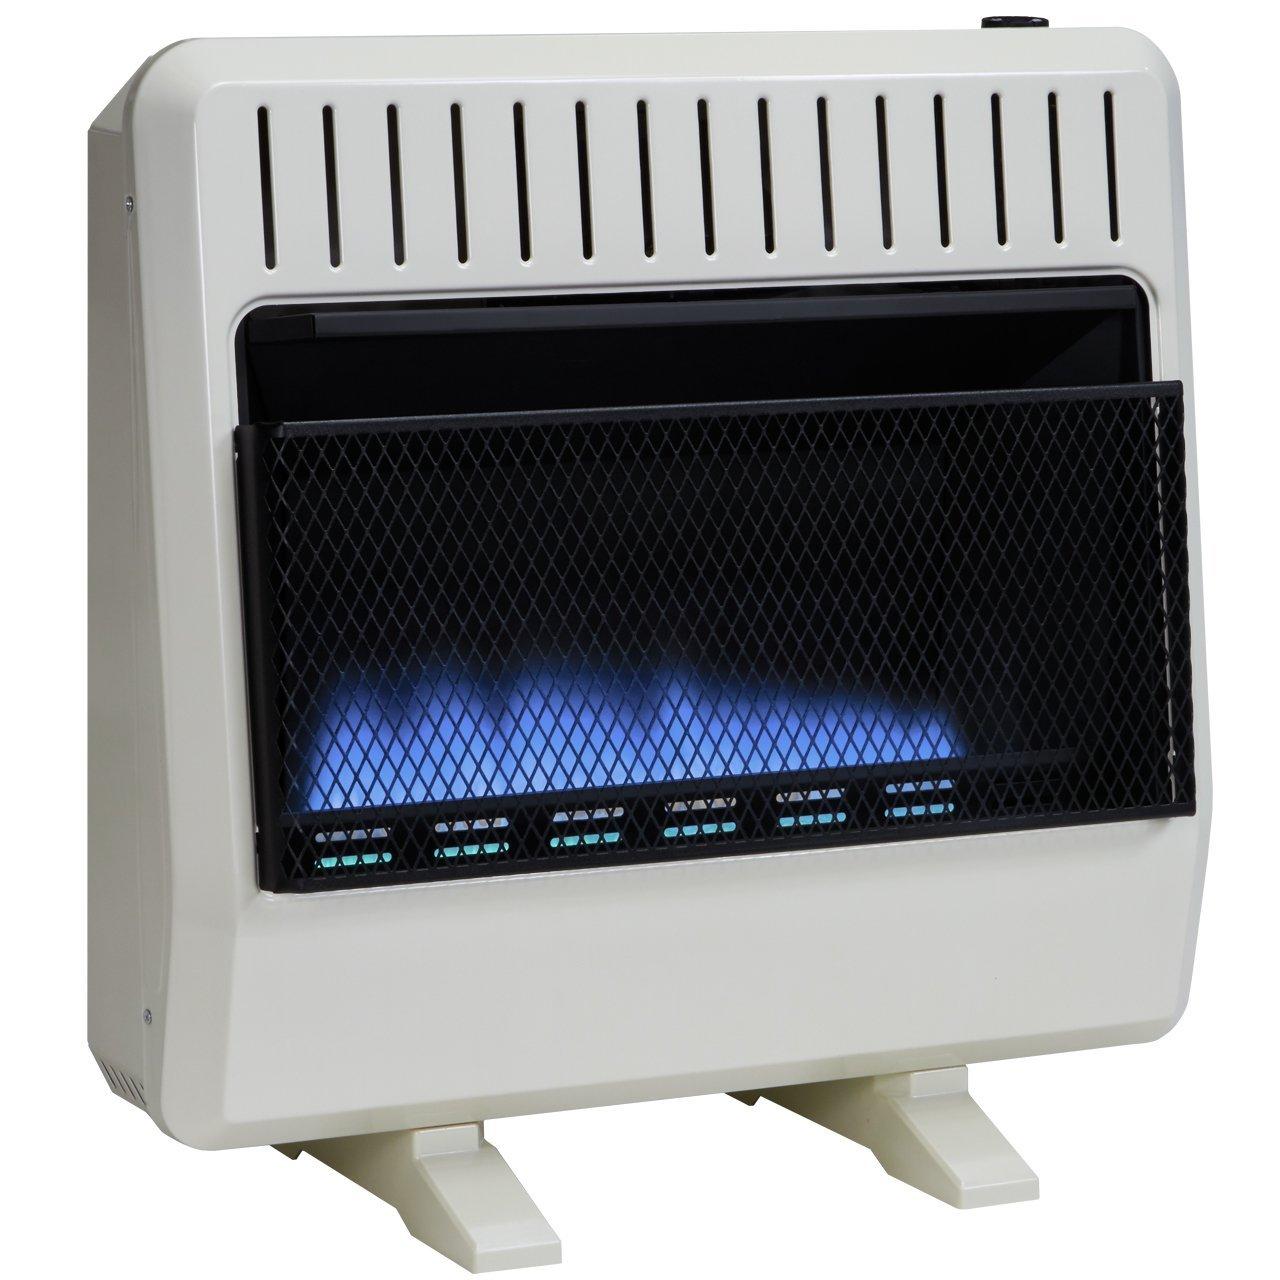 Avenger Dual Fuel Vent Free Blue Flame Heater - 30,000 BTU, Model# FDT30BF